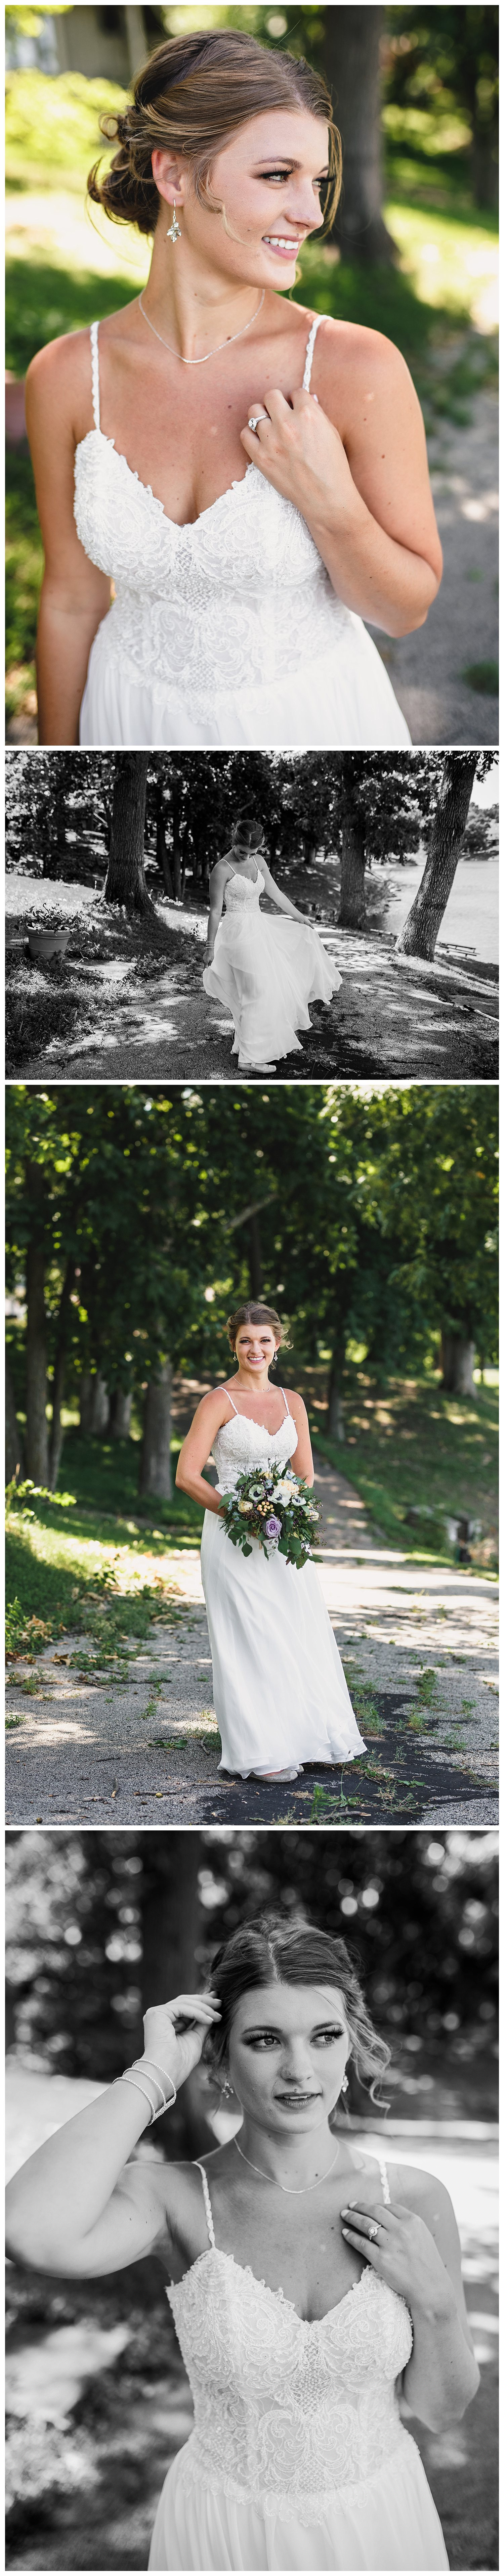 Kelsey_Diane_Photography_Kansas_City_Engagement_Wedding_Photographer_Midwest_Traveling_Missouri_Lee_Andrew_Hall_And_Garden_Blue_Springs_Wedding_Clayton_Kimberly_Summer_Wedding_0826.jpg